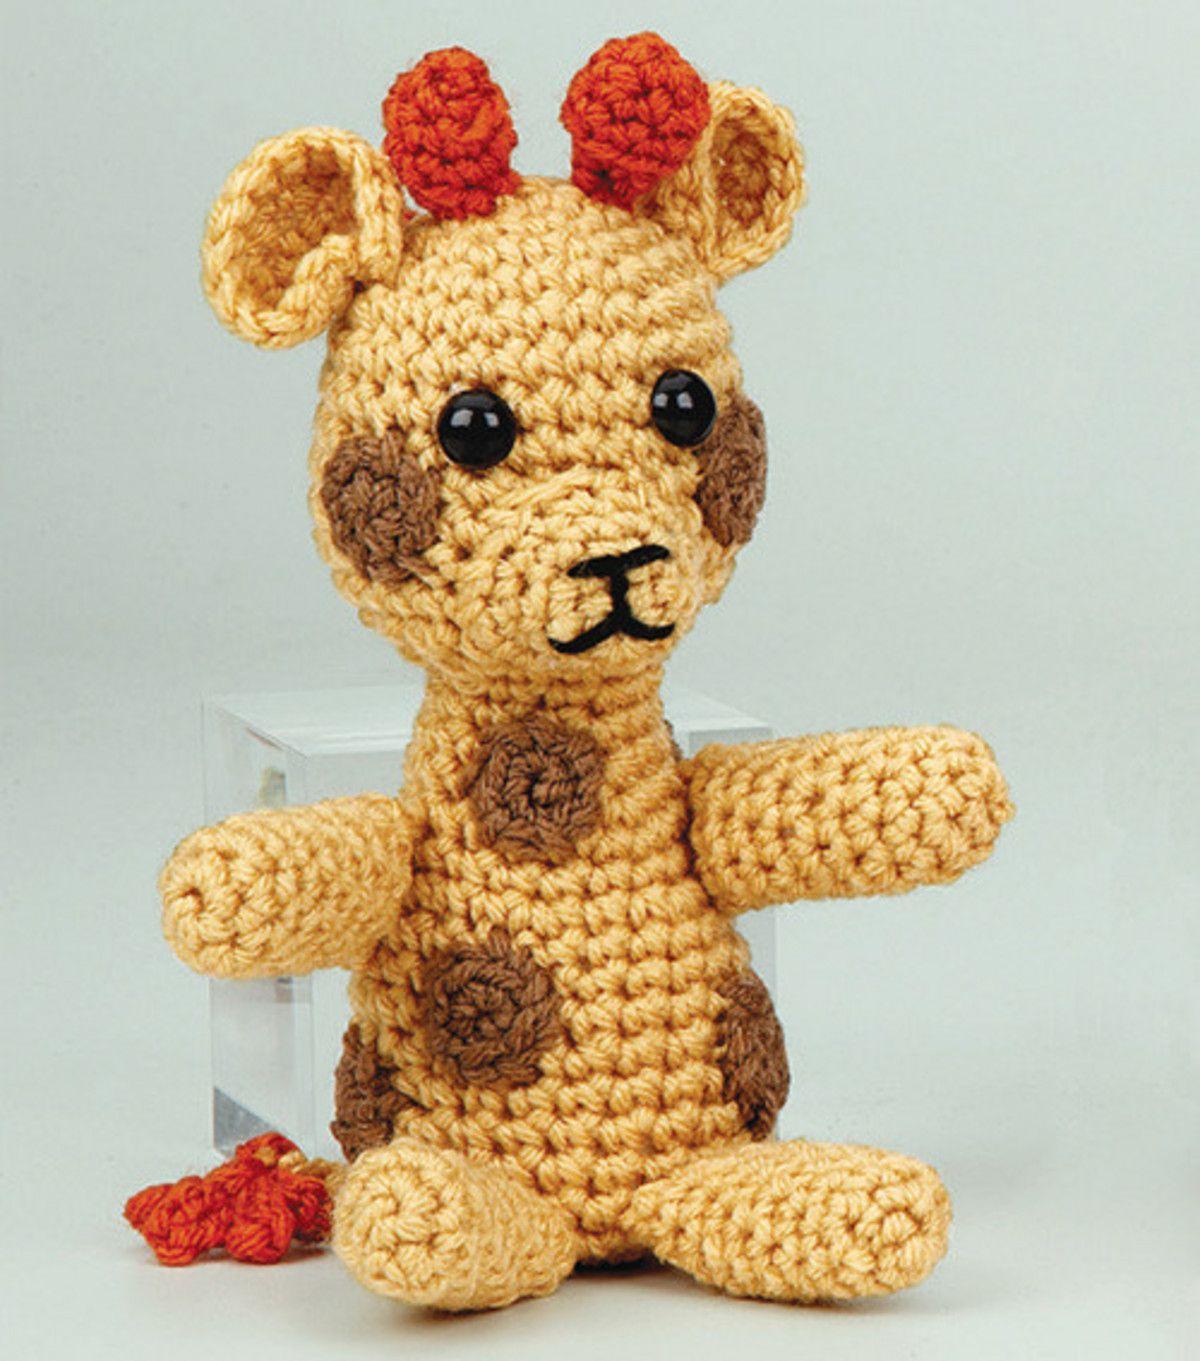 Free Crochet Animal Patterns | Giraffe, Crochet and Free crochet